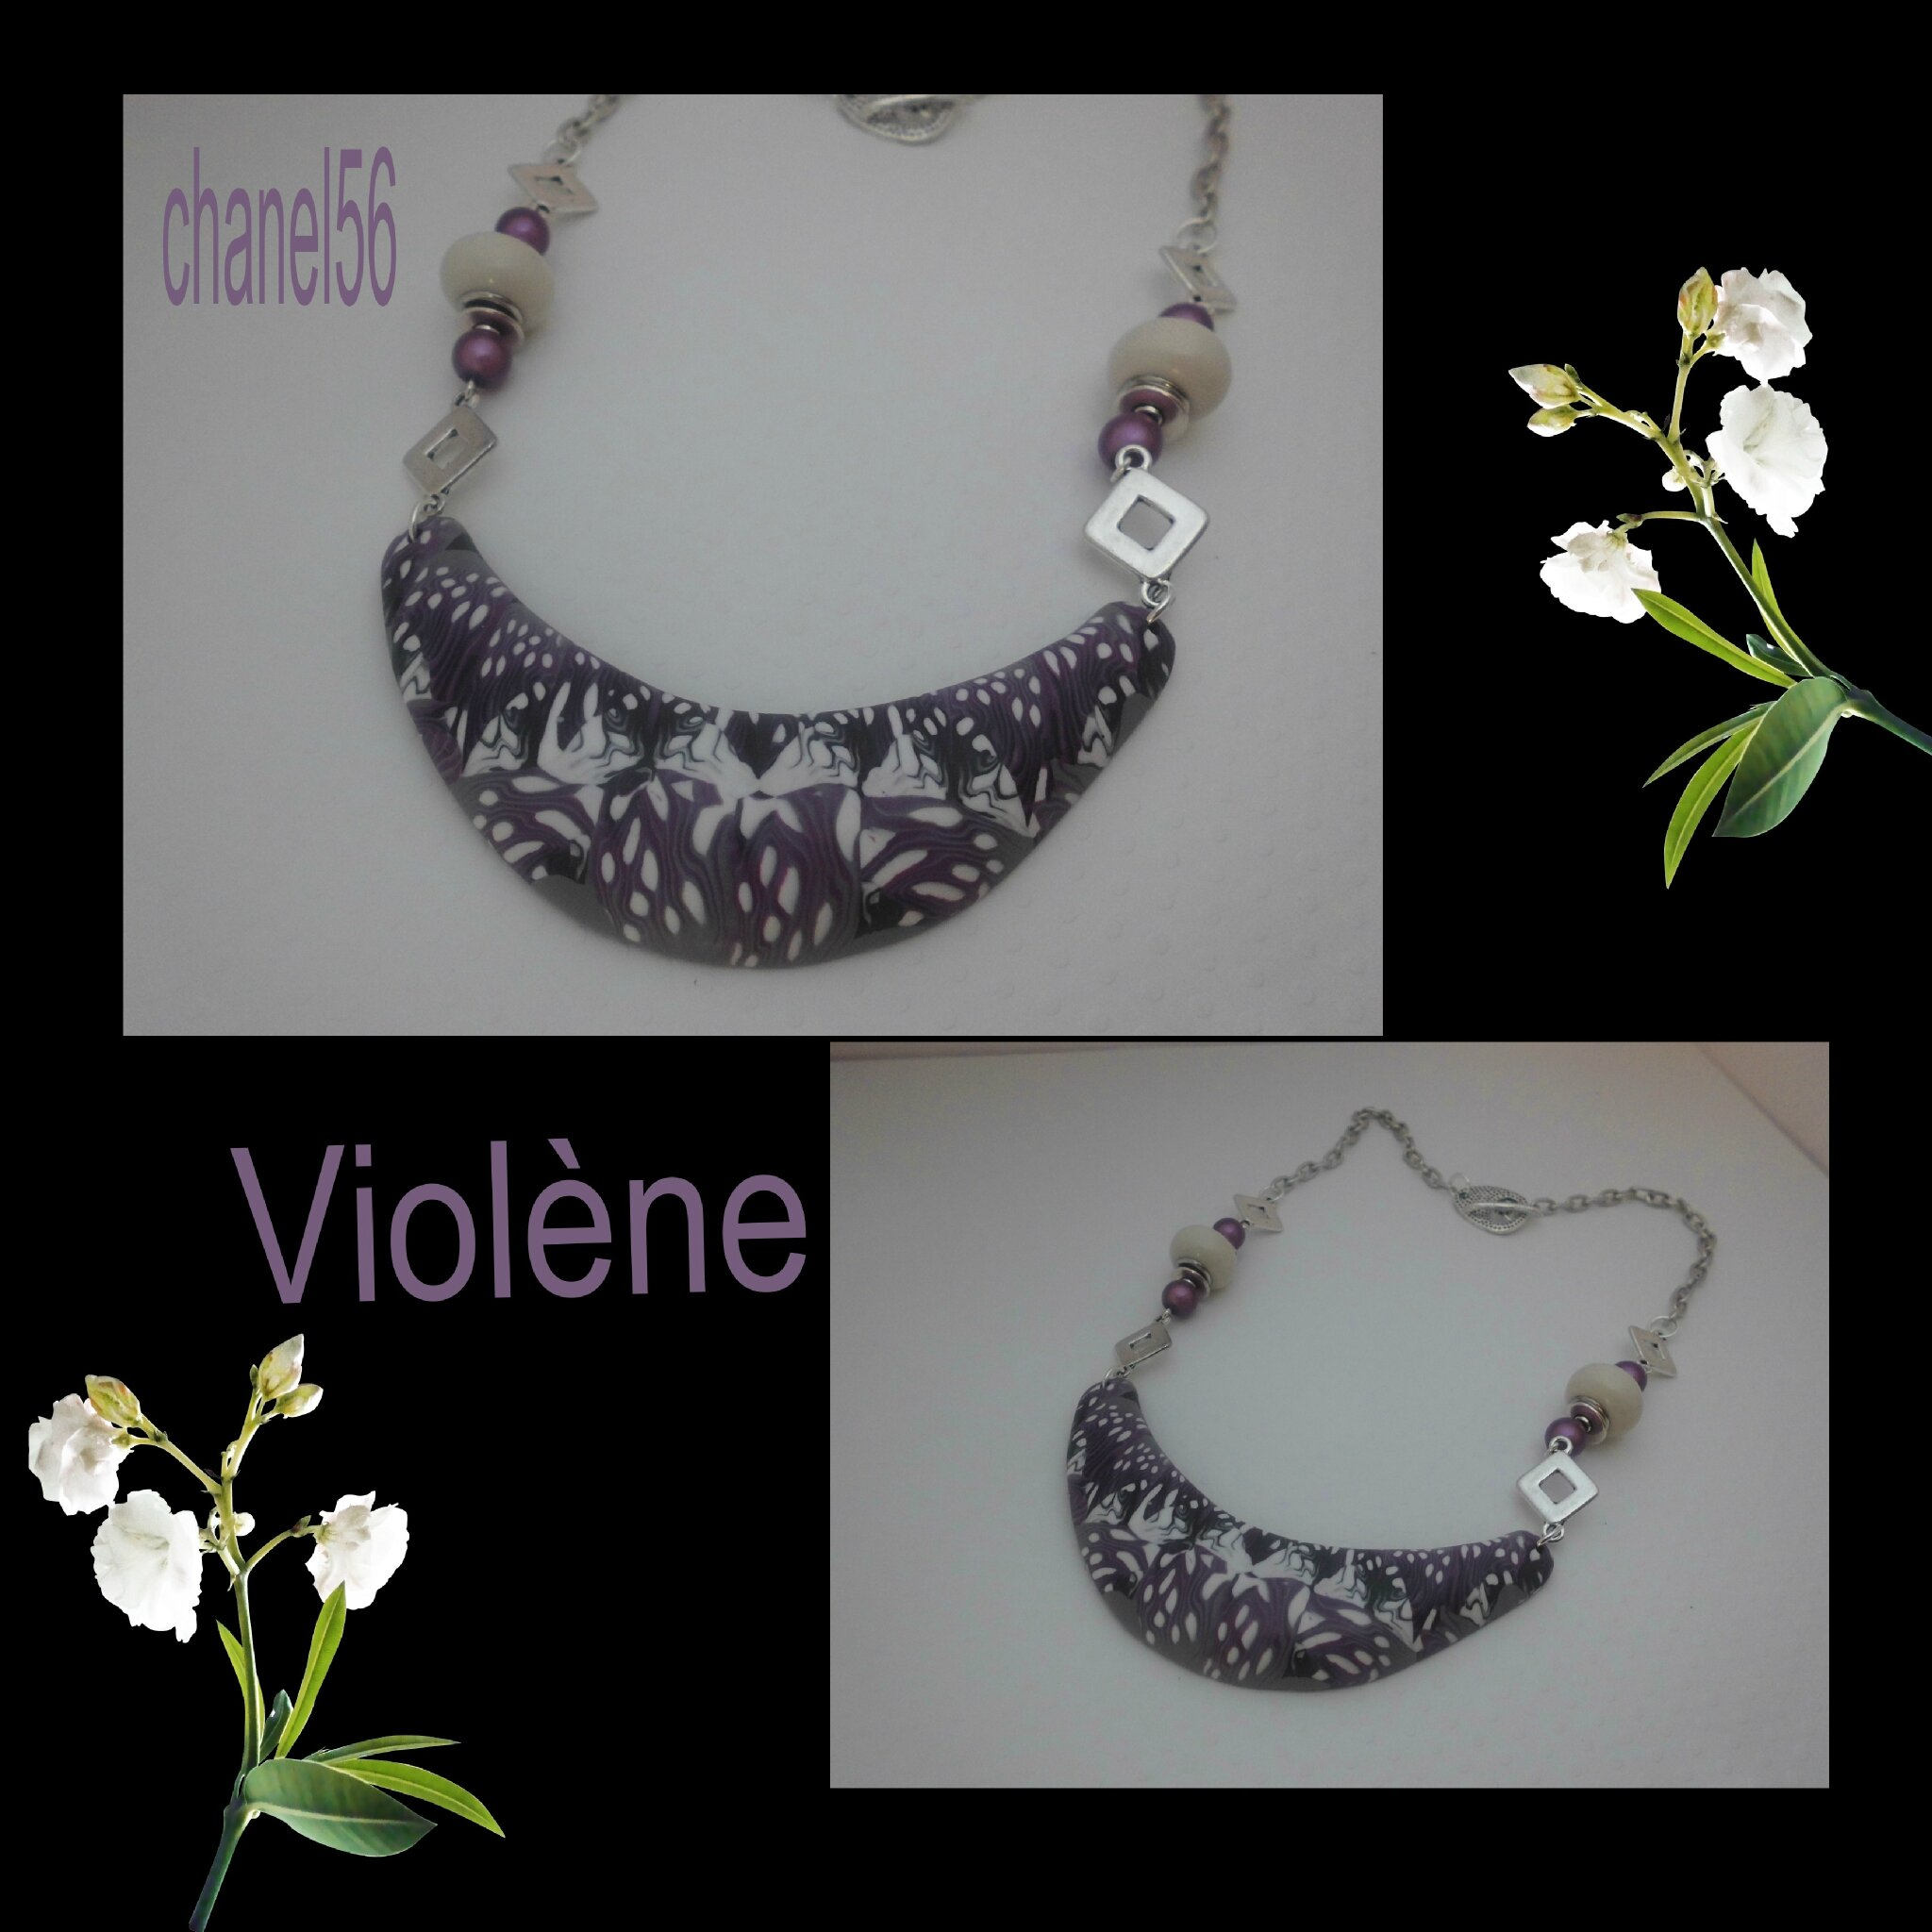 Violène